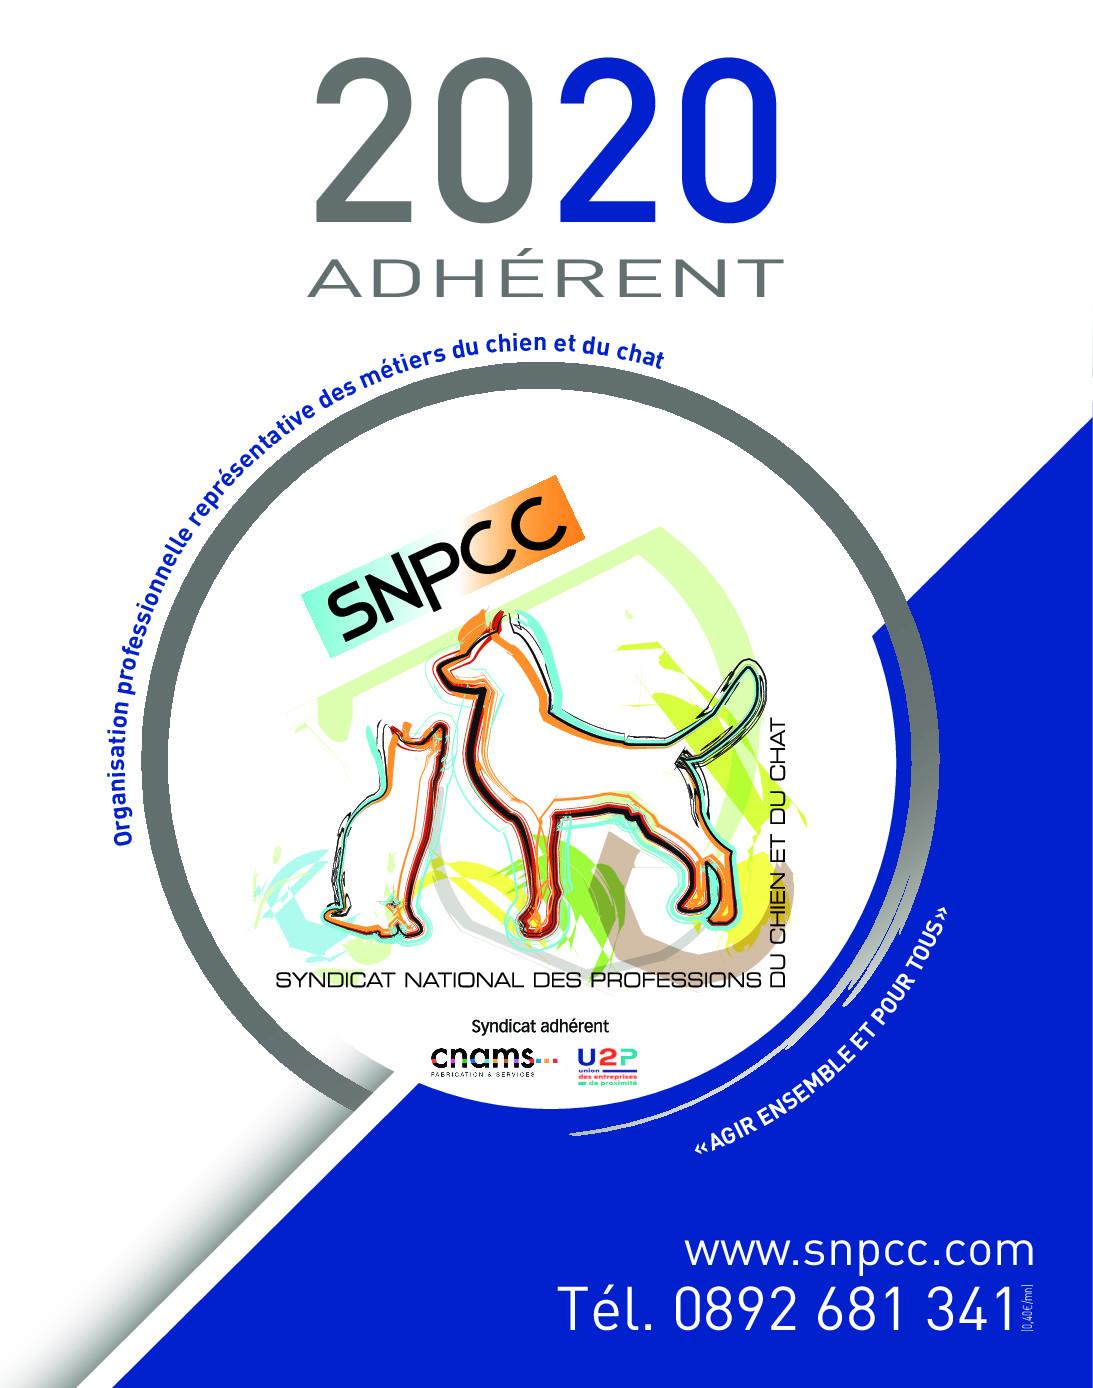 PLAQUE SNPCC 2020